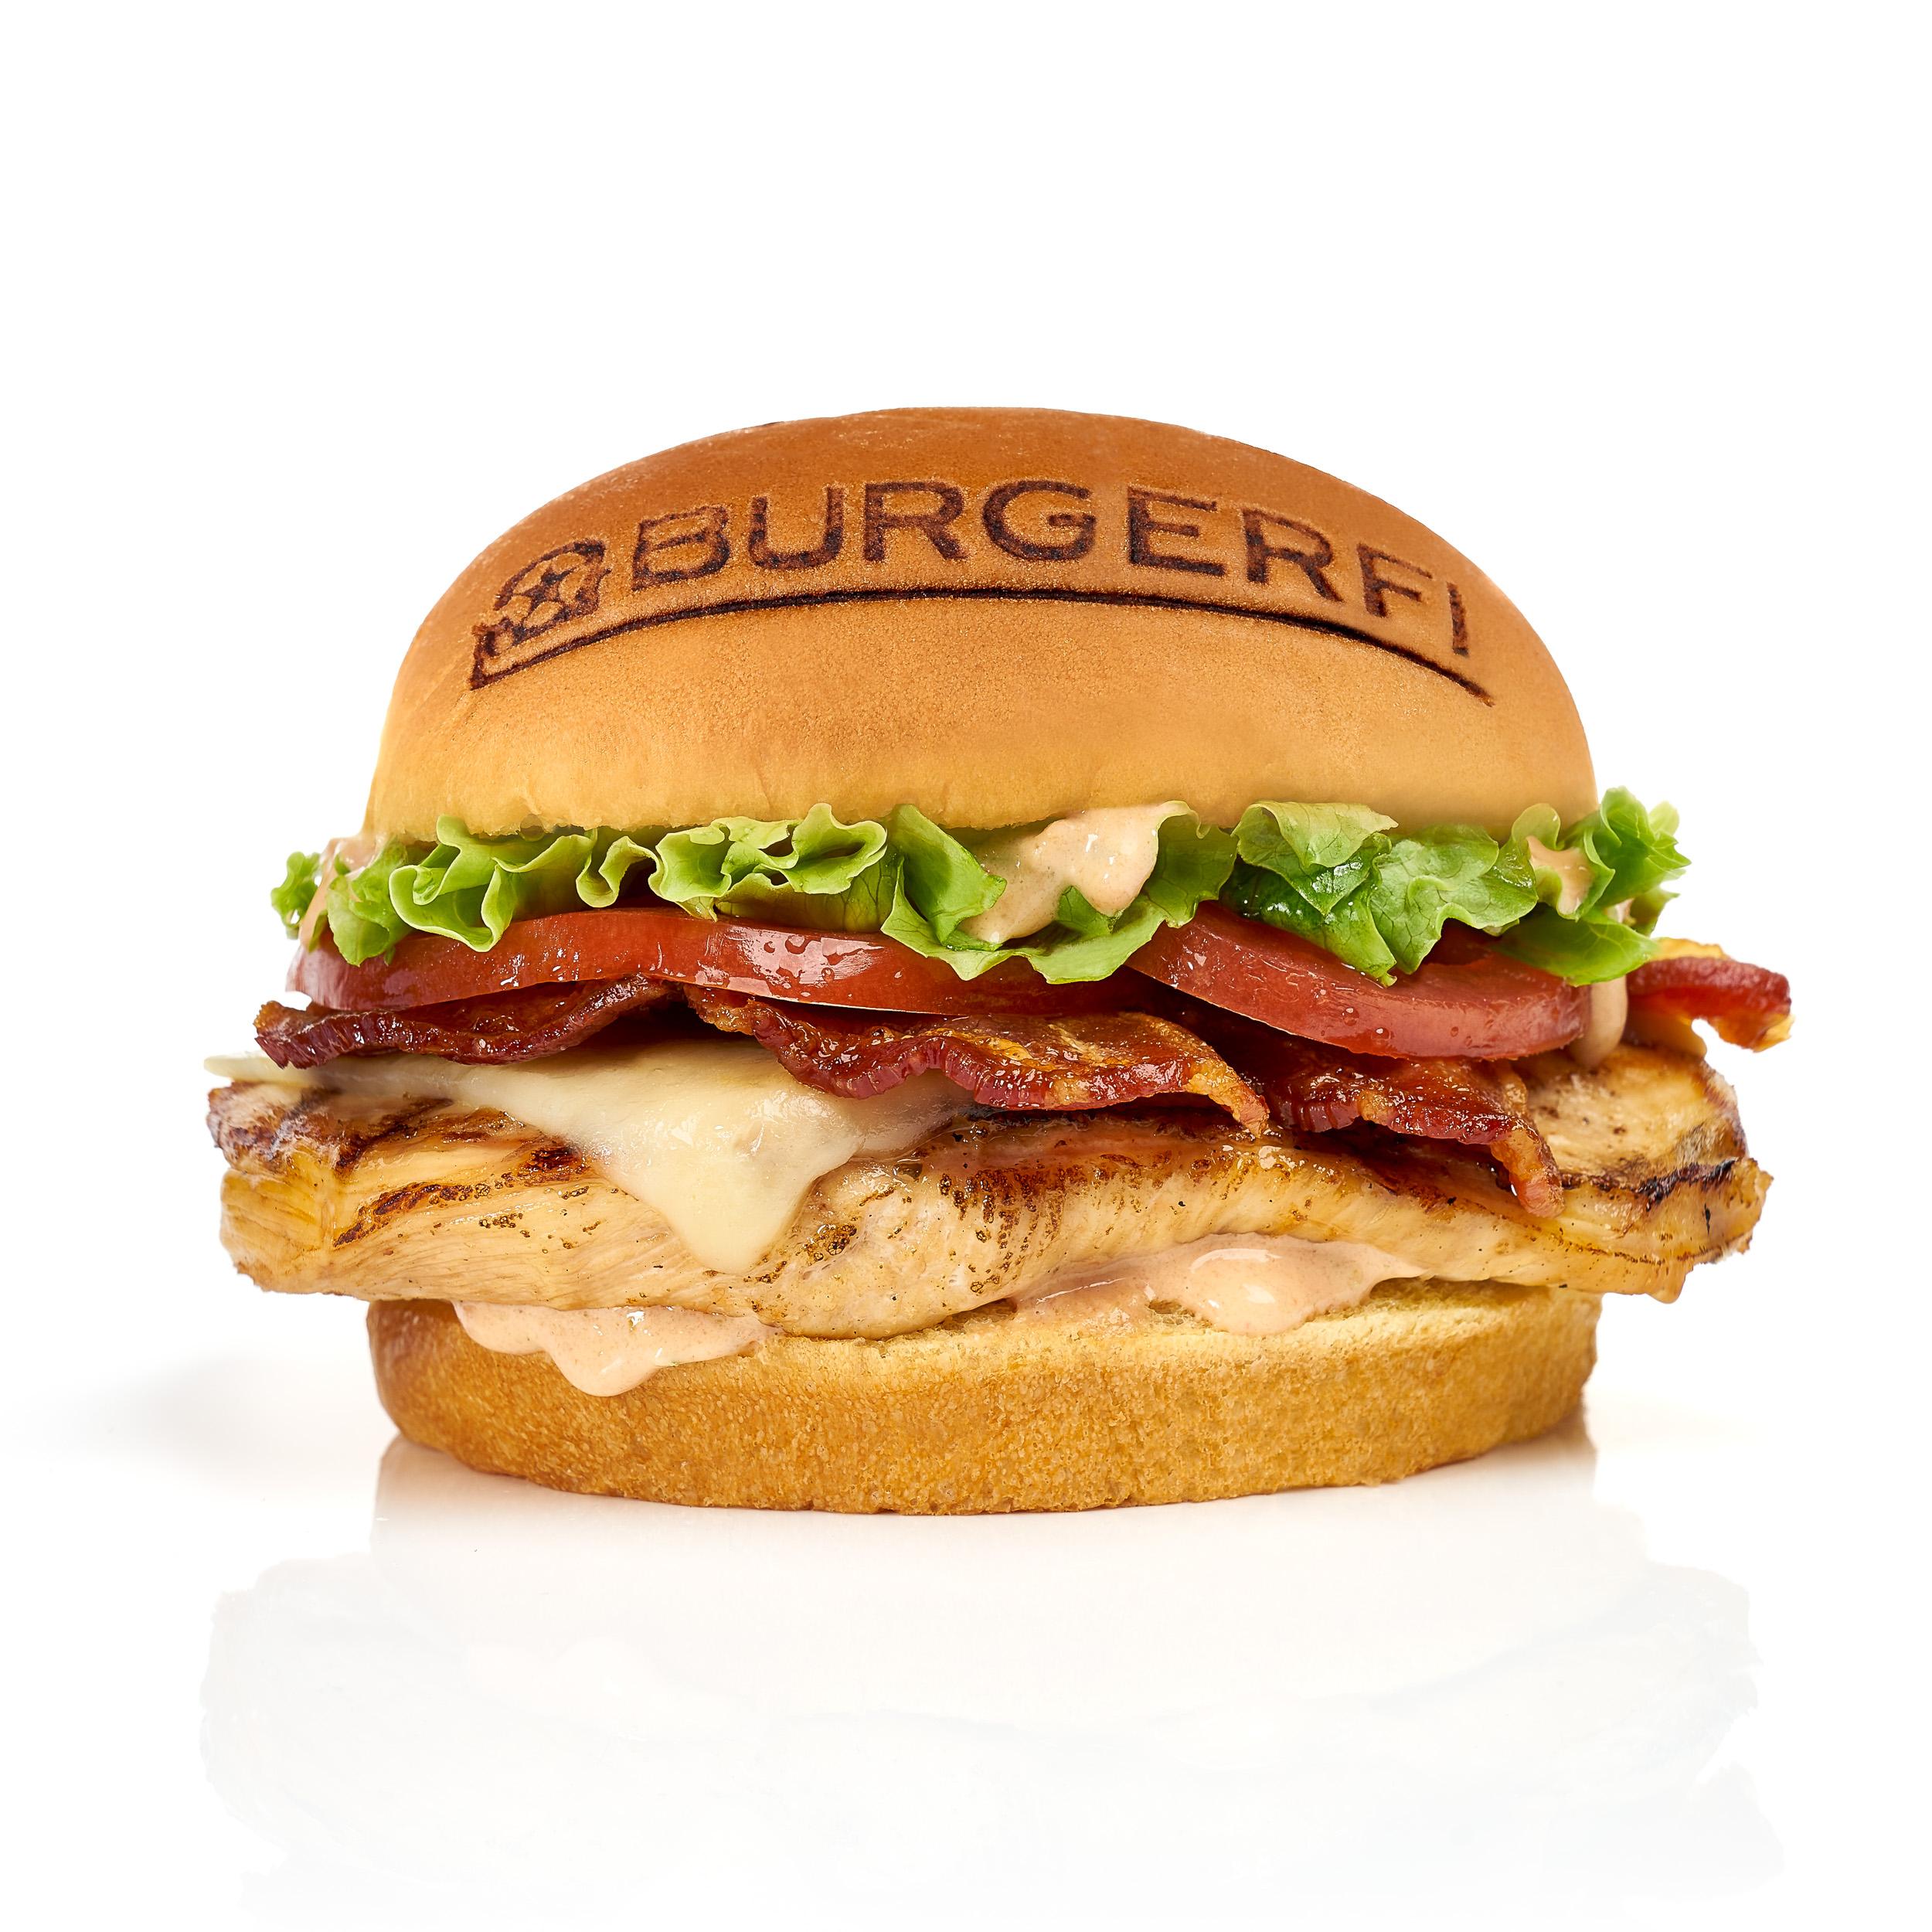 BurgerFi Chicken Sandwich -  FEC Photo - Miami Food Photographer.jpg